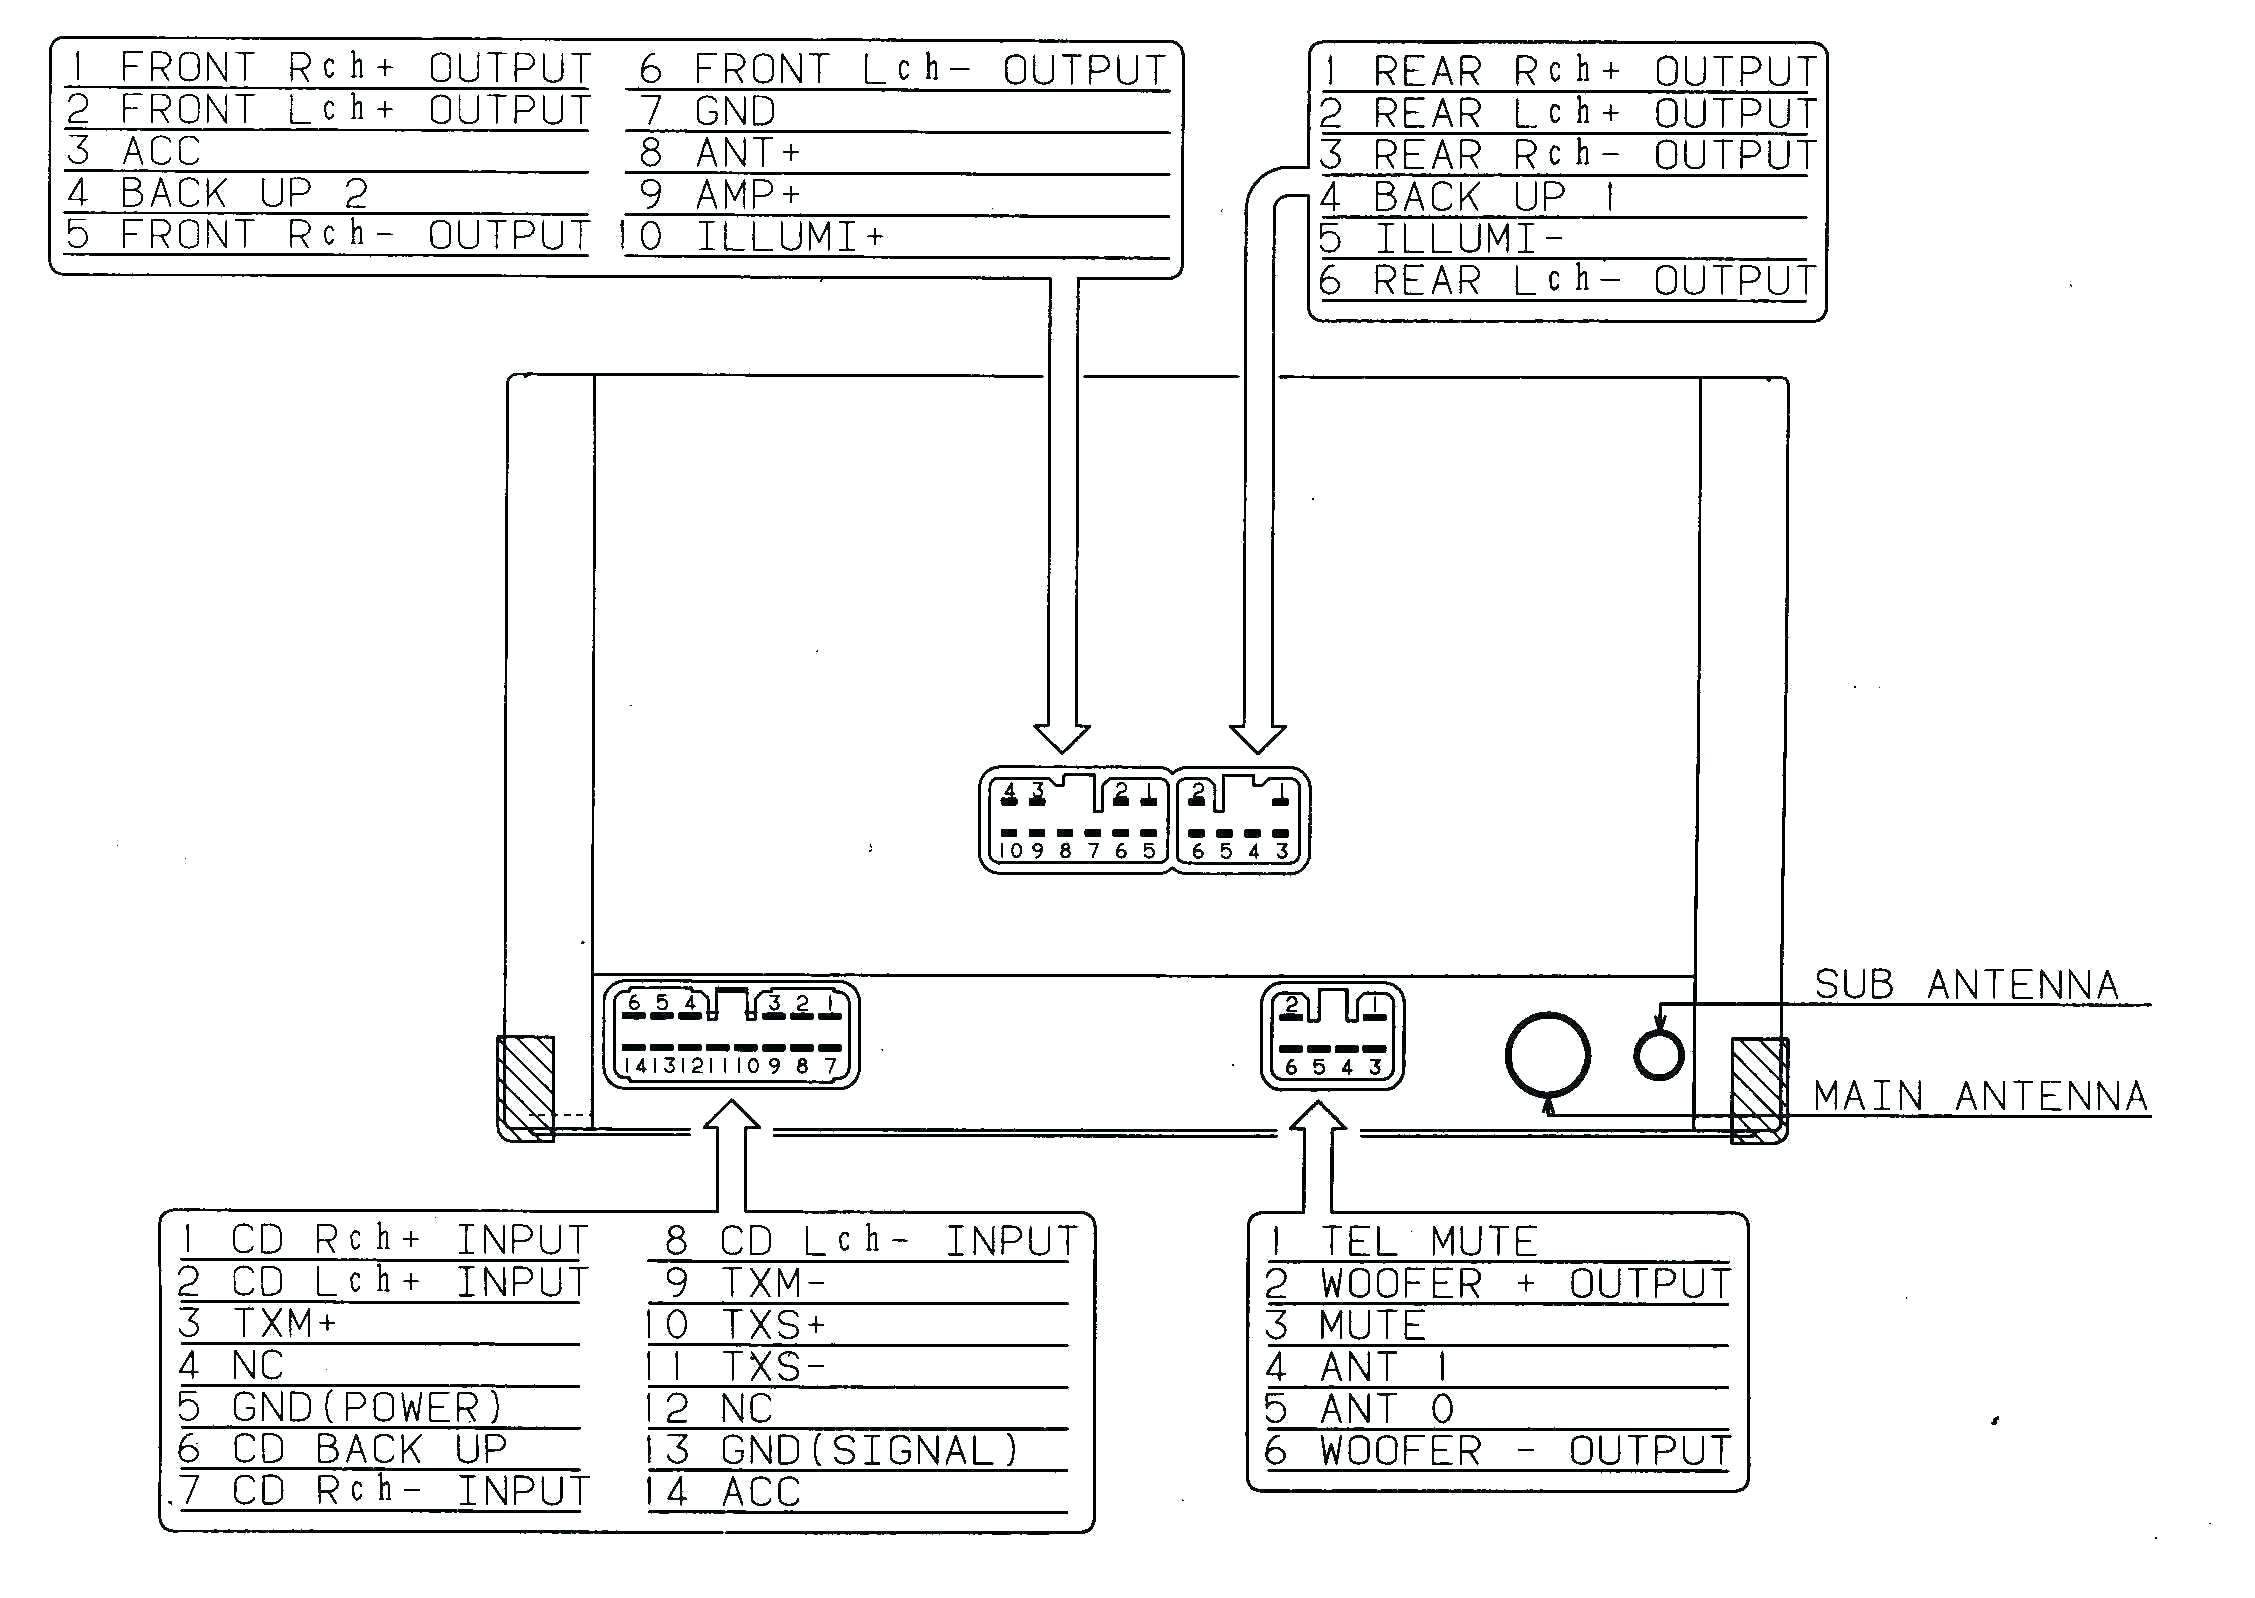 Pioneer Deh 1600 Wiring Diagram Pioneer Avic D3 Wiring Manual Harness Diagram with Amusing Esp Of Pioneer Deh 1600 Wiring Diagram